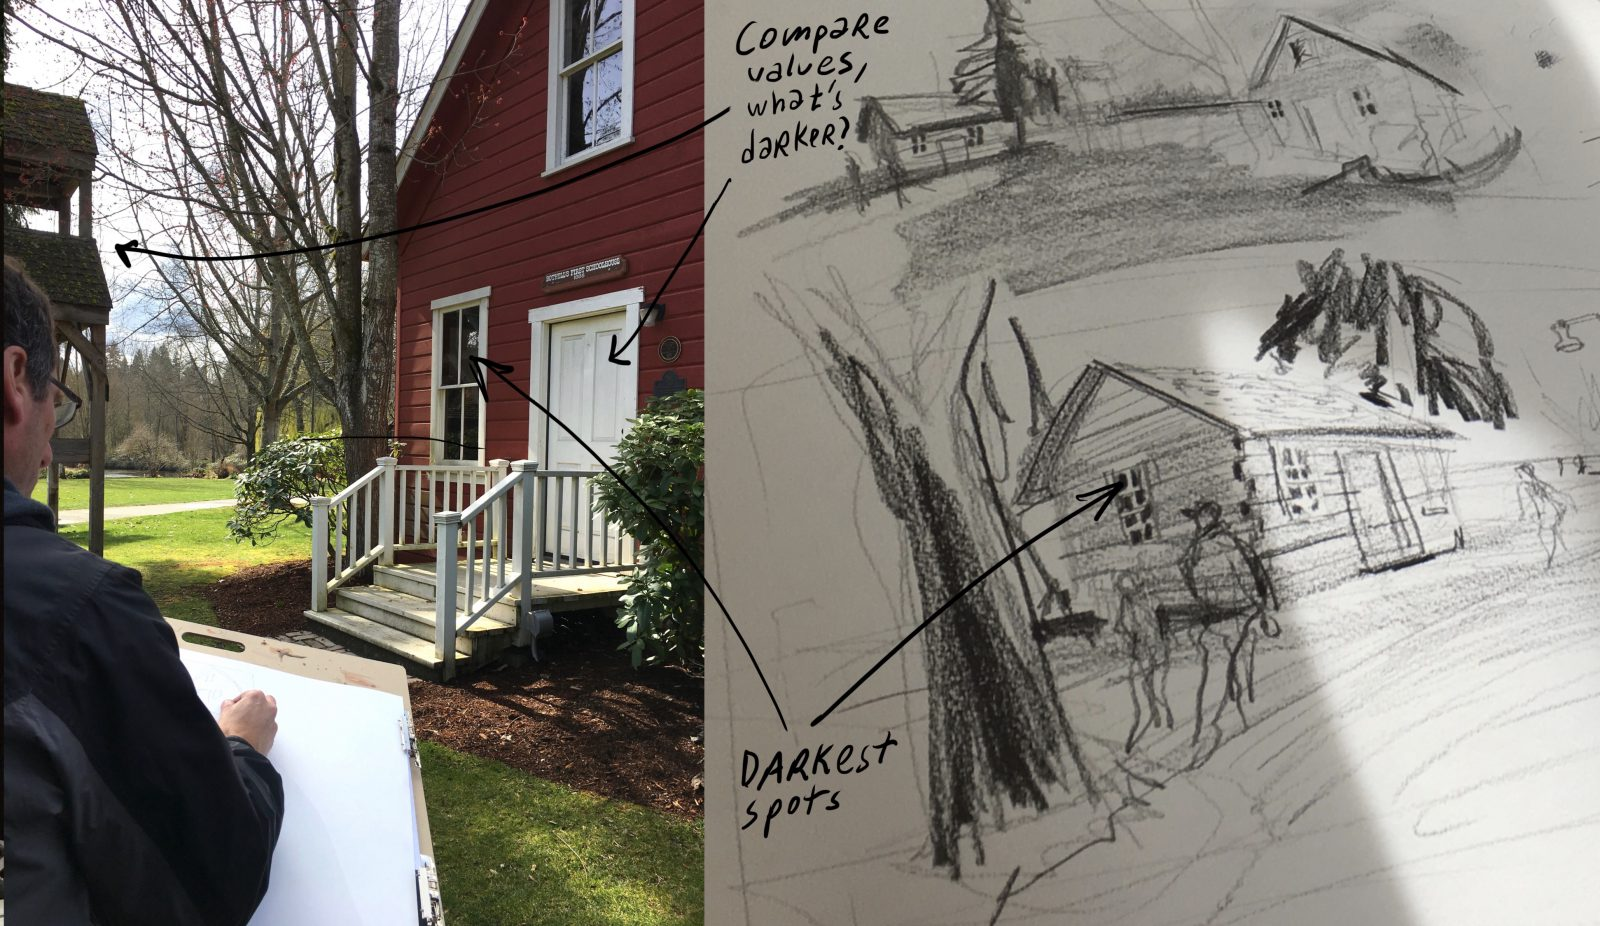 Workshop rewind: Sketching in northwest river town of Bothell